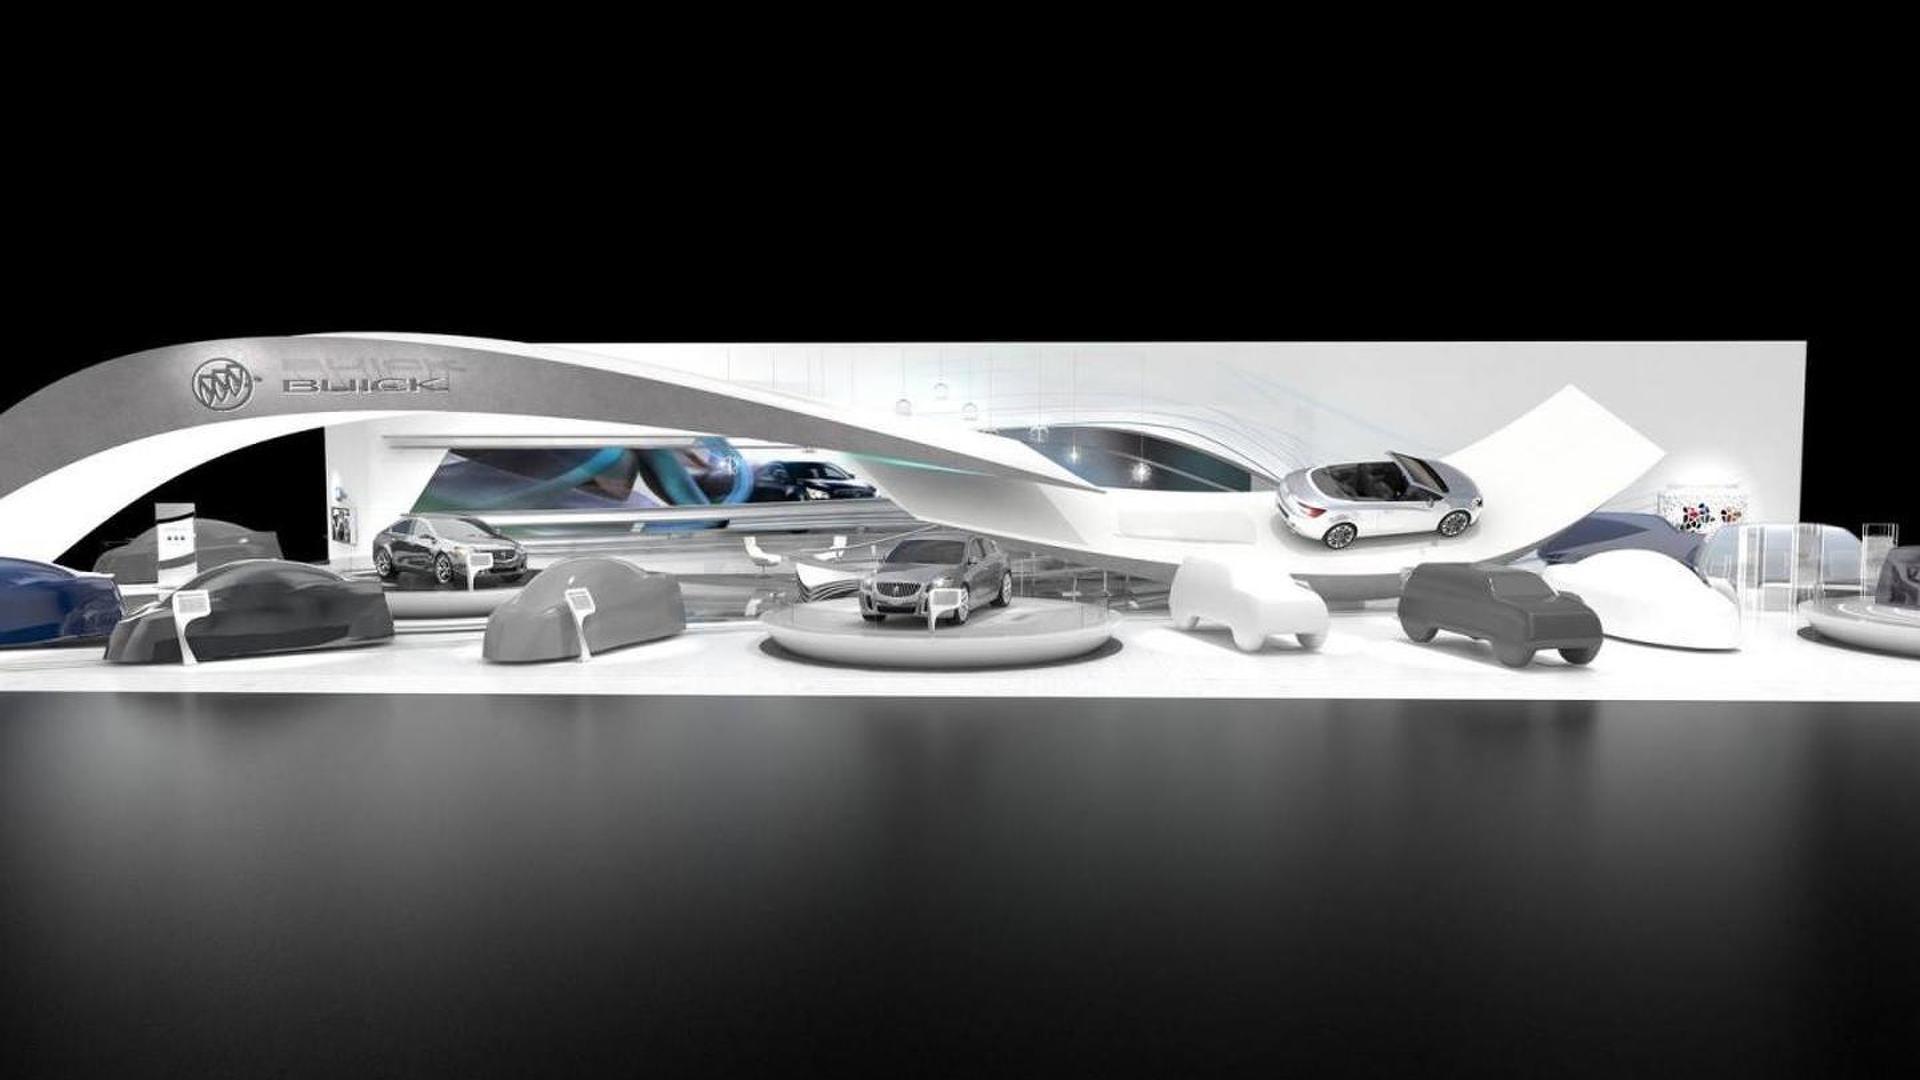 Buick Cascada convertible teased for Detroit